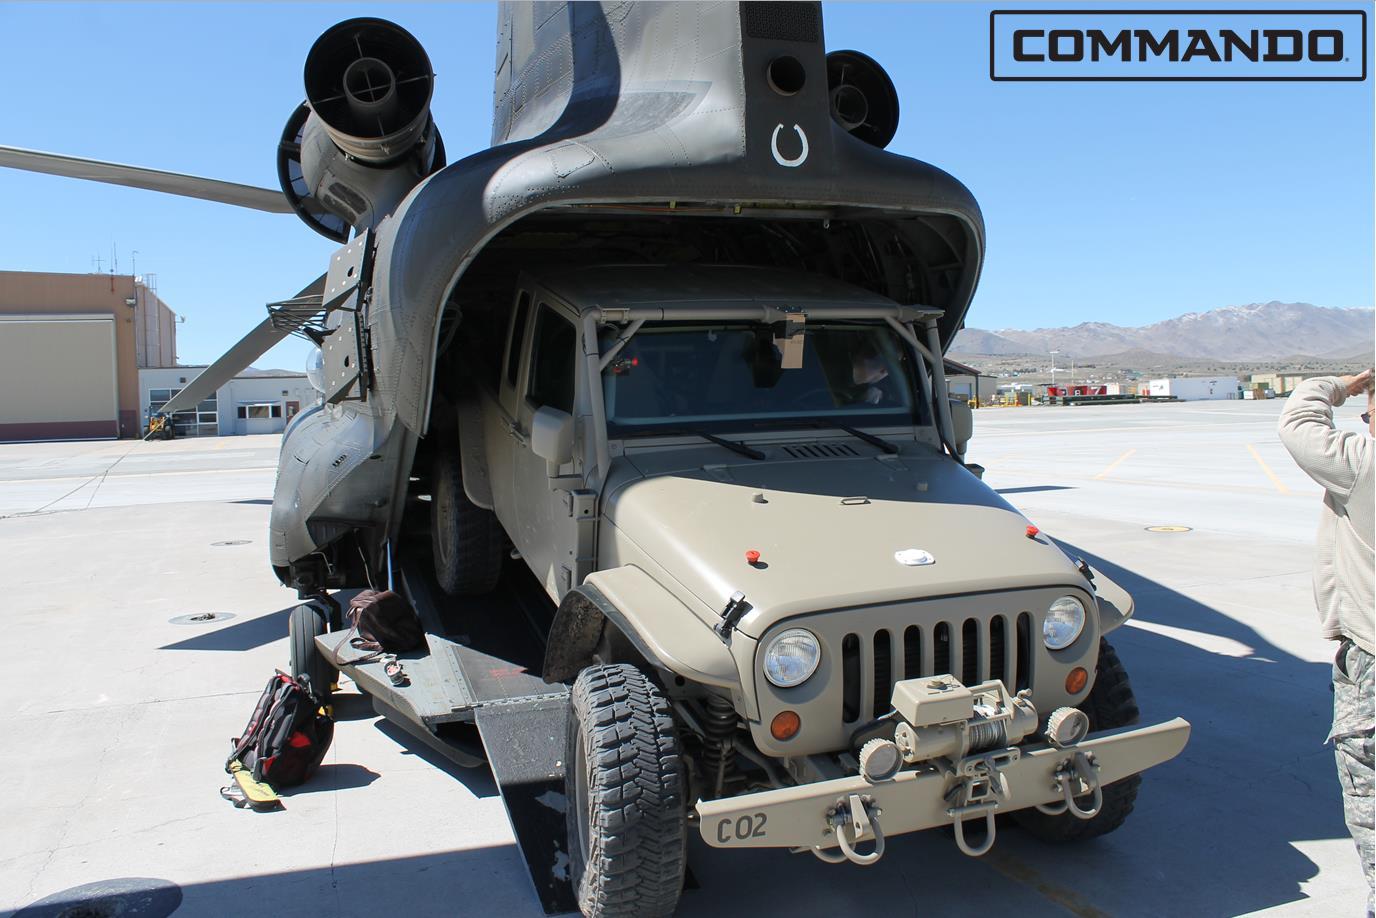 Hendrick Commando Wrangler, Jeep army, Jeep military USA, Jeep Forum, Jeep Forums, Jeep Australia, JEEP Wrangler, JEEP Cherokee, Jeep Forsale, Jeep Classifieds